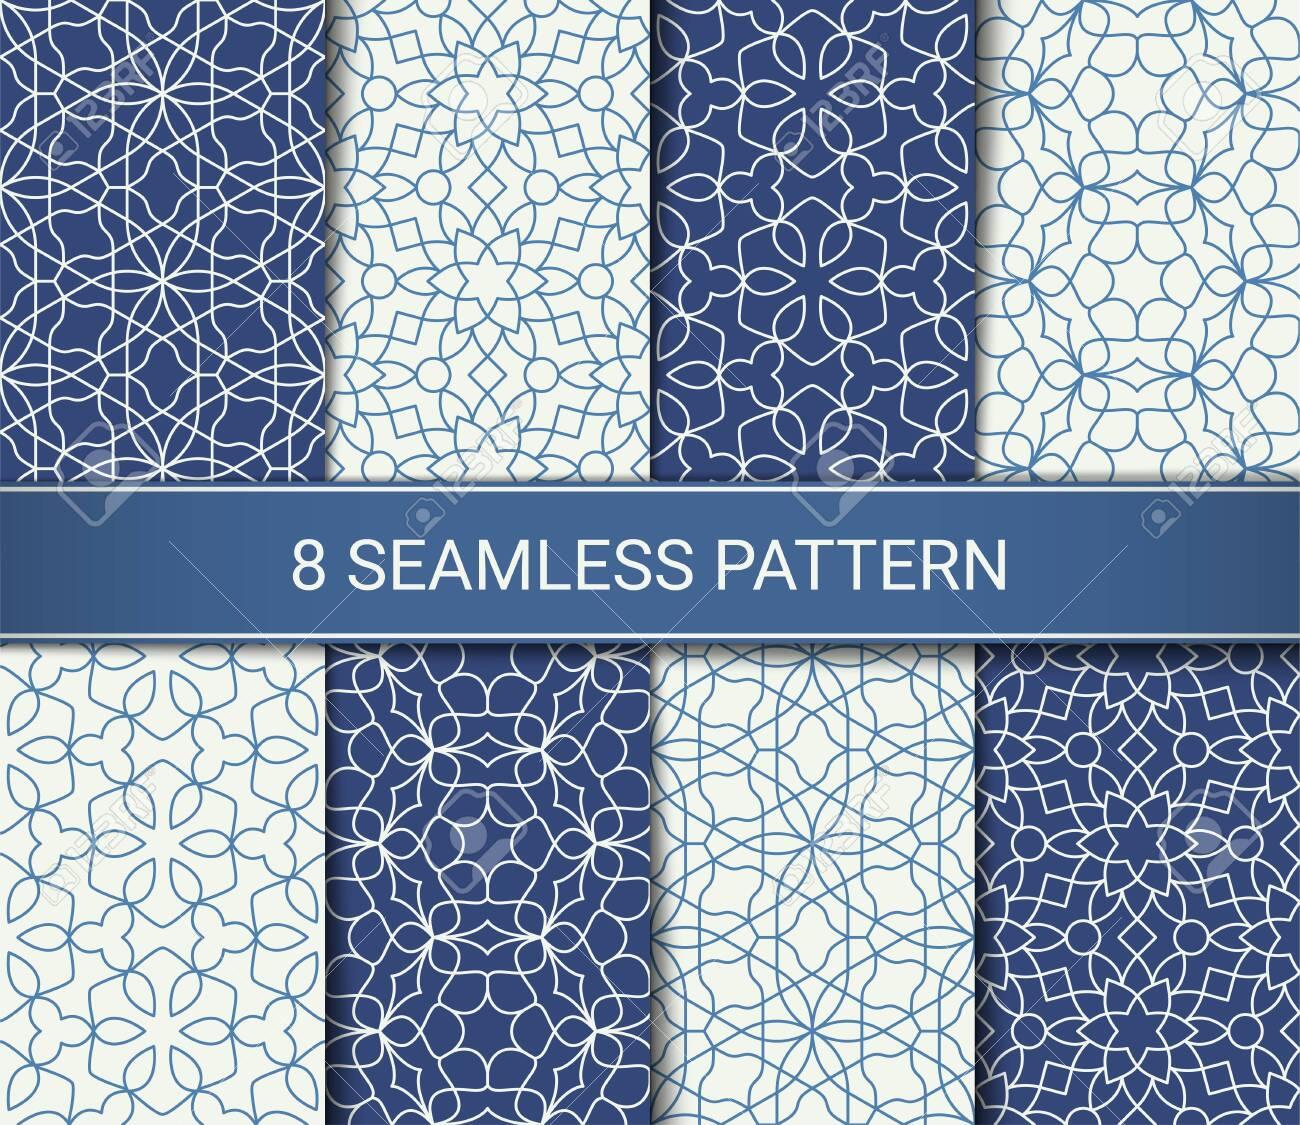 Set of abstract geometric seamless patterns artwork, vector illustration - 146670994